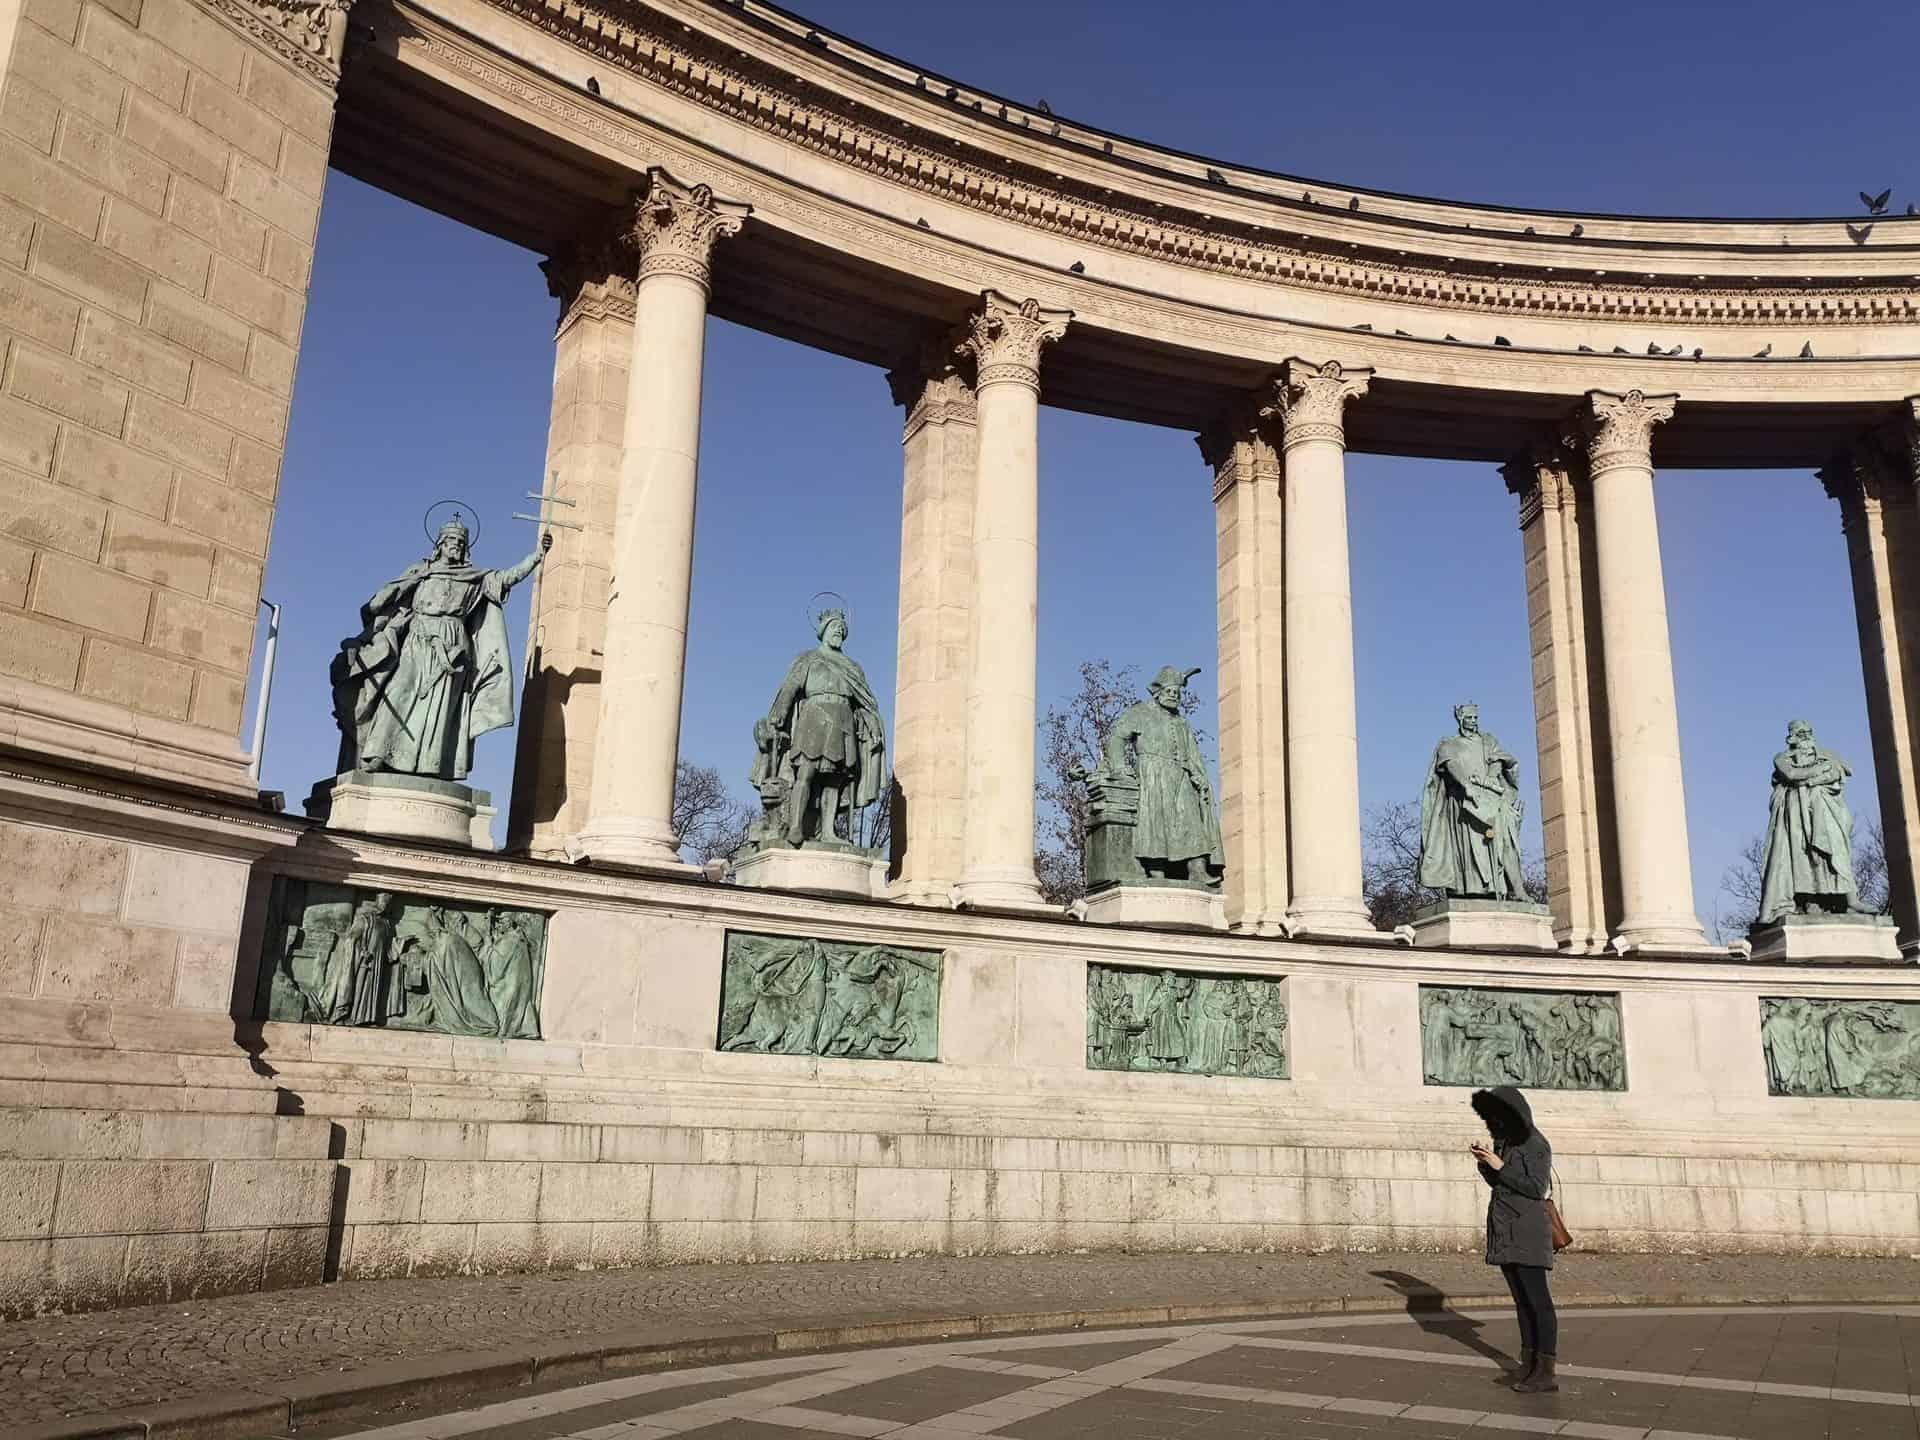 historicalbudapest_Millennial Budapest 6 - Millennial Monument_B